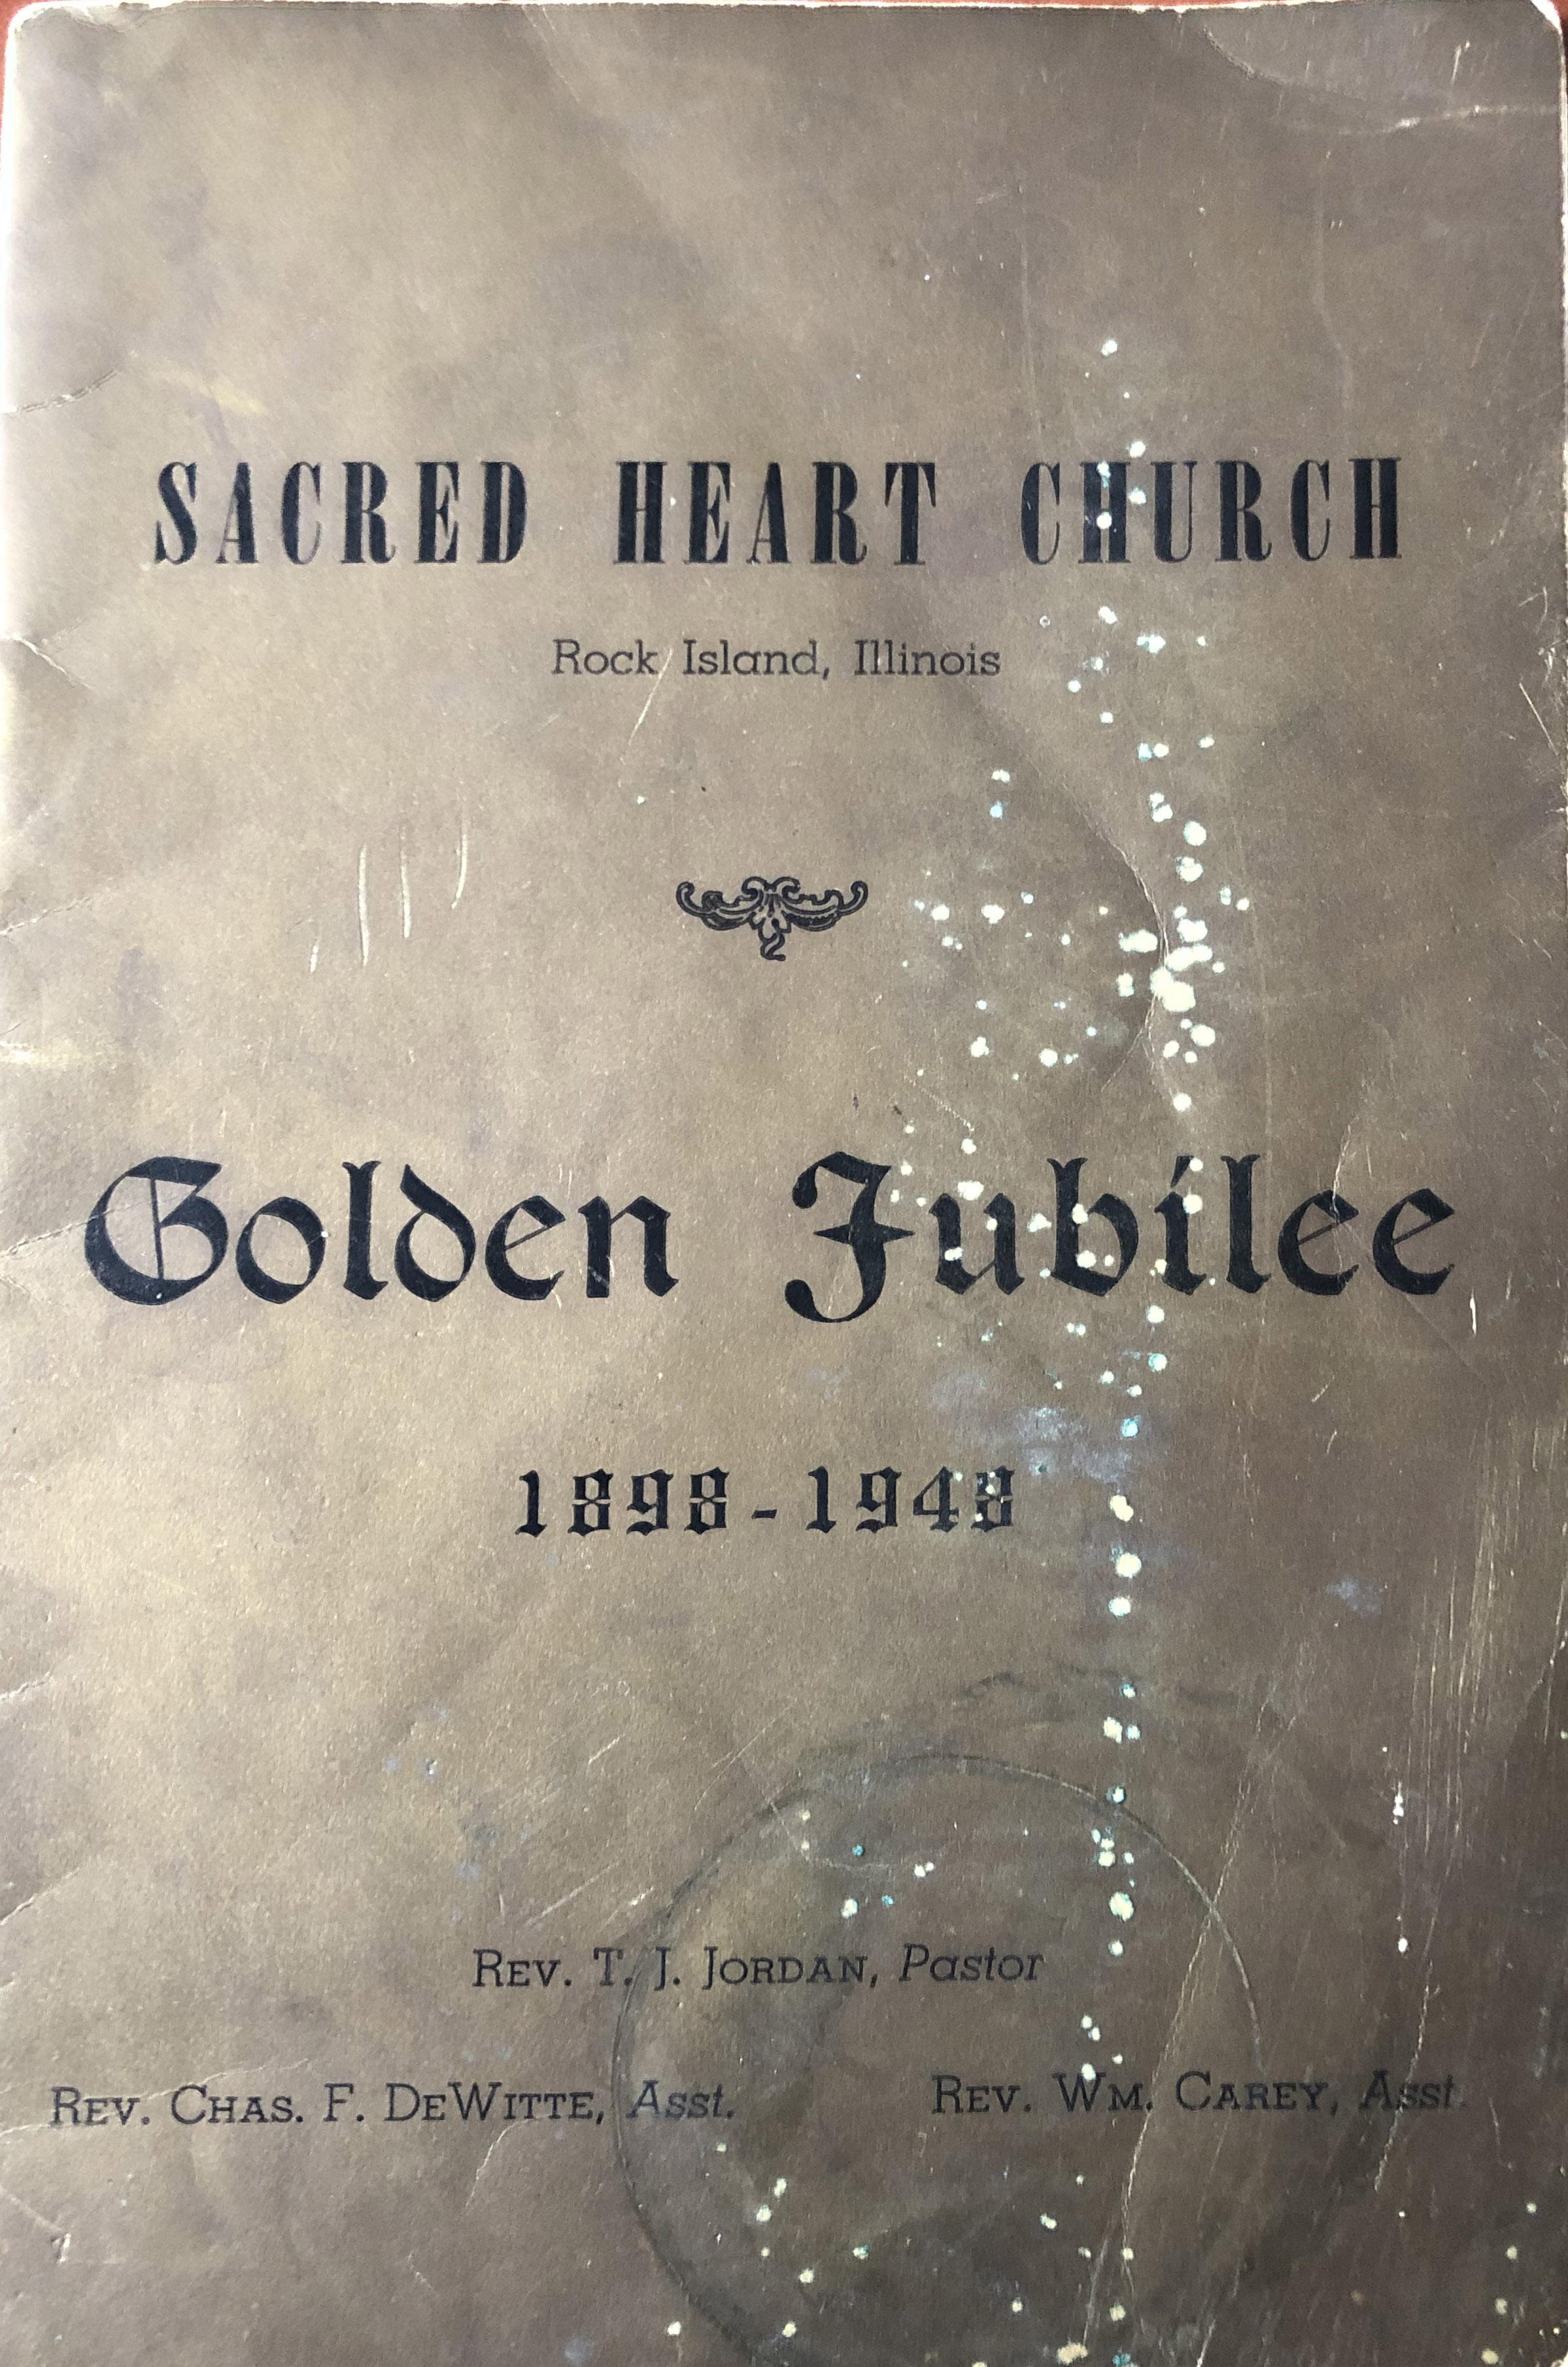 Golden Jubilee Celebration, 1949